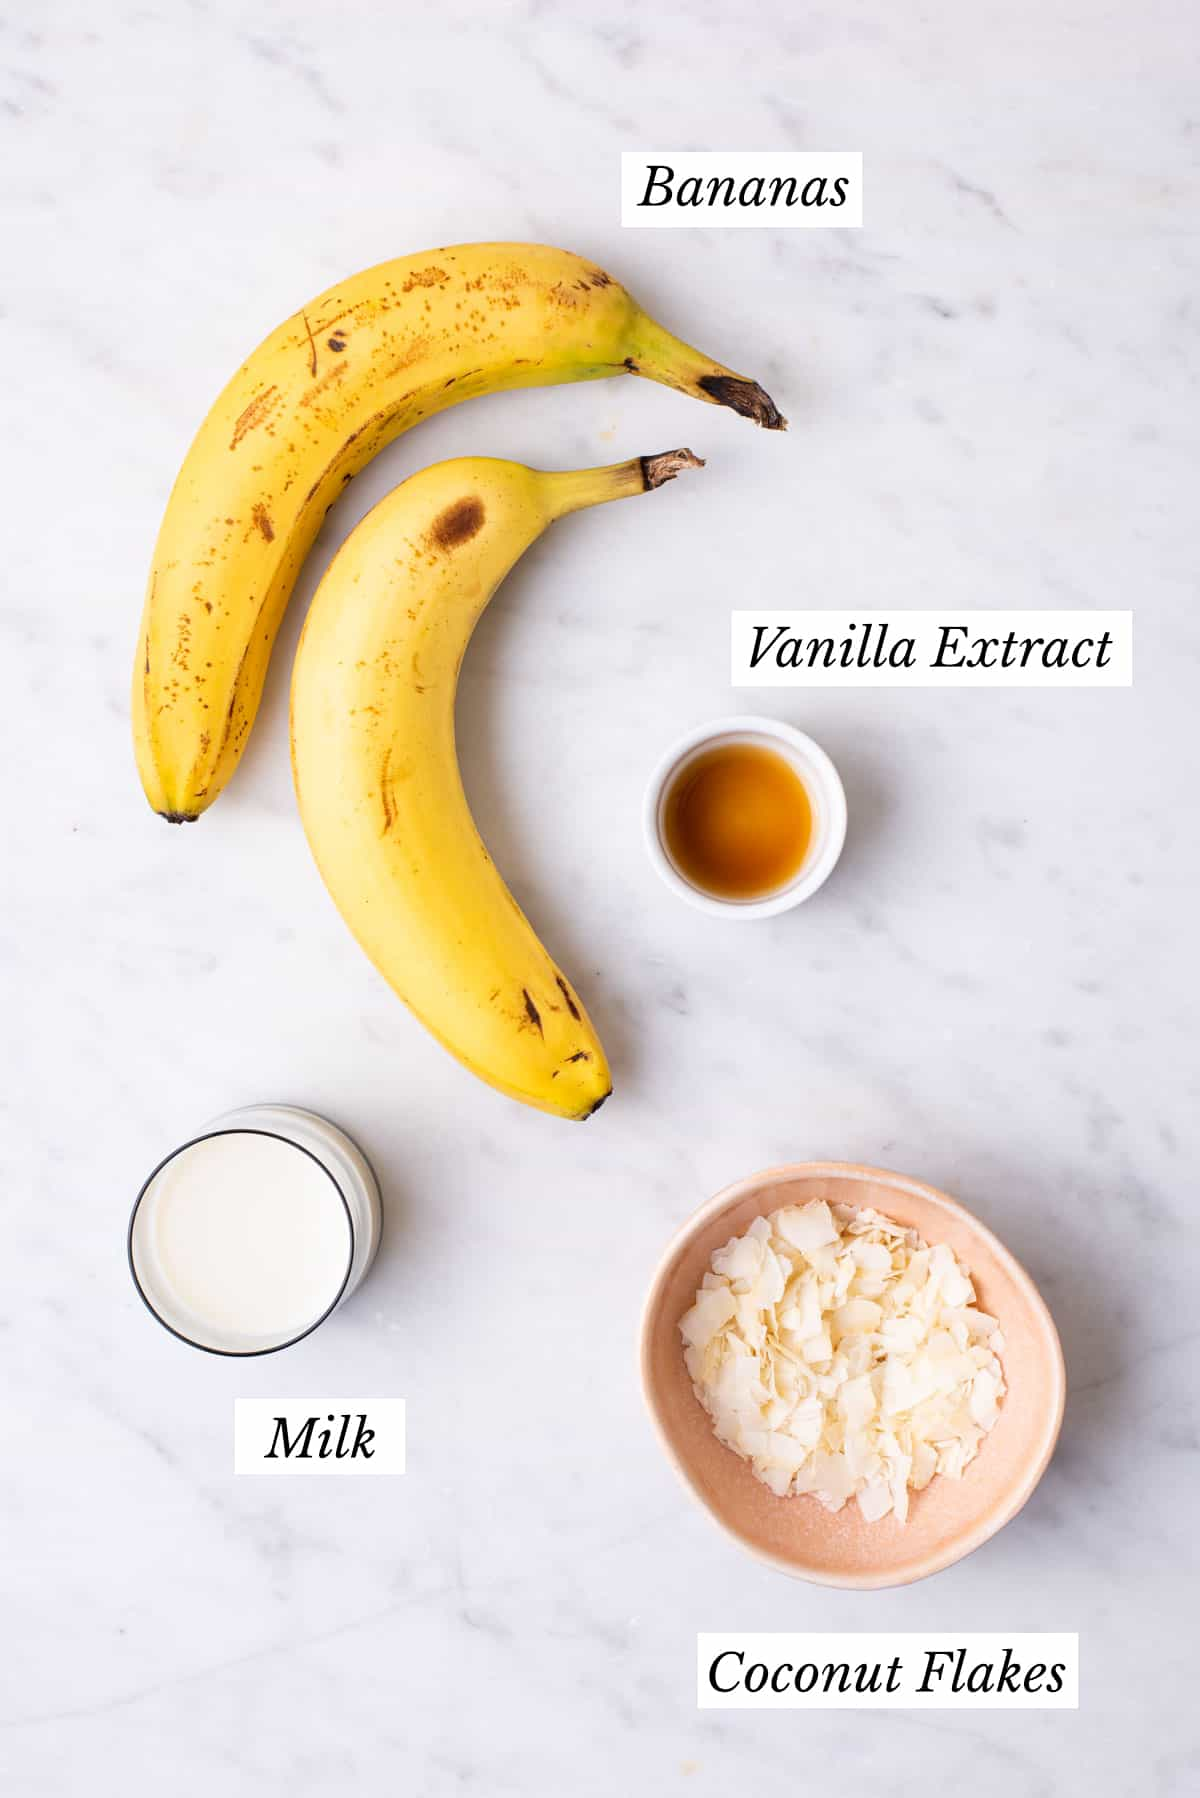 Ingredients gathered to make no-churn banana ice cream.